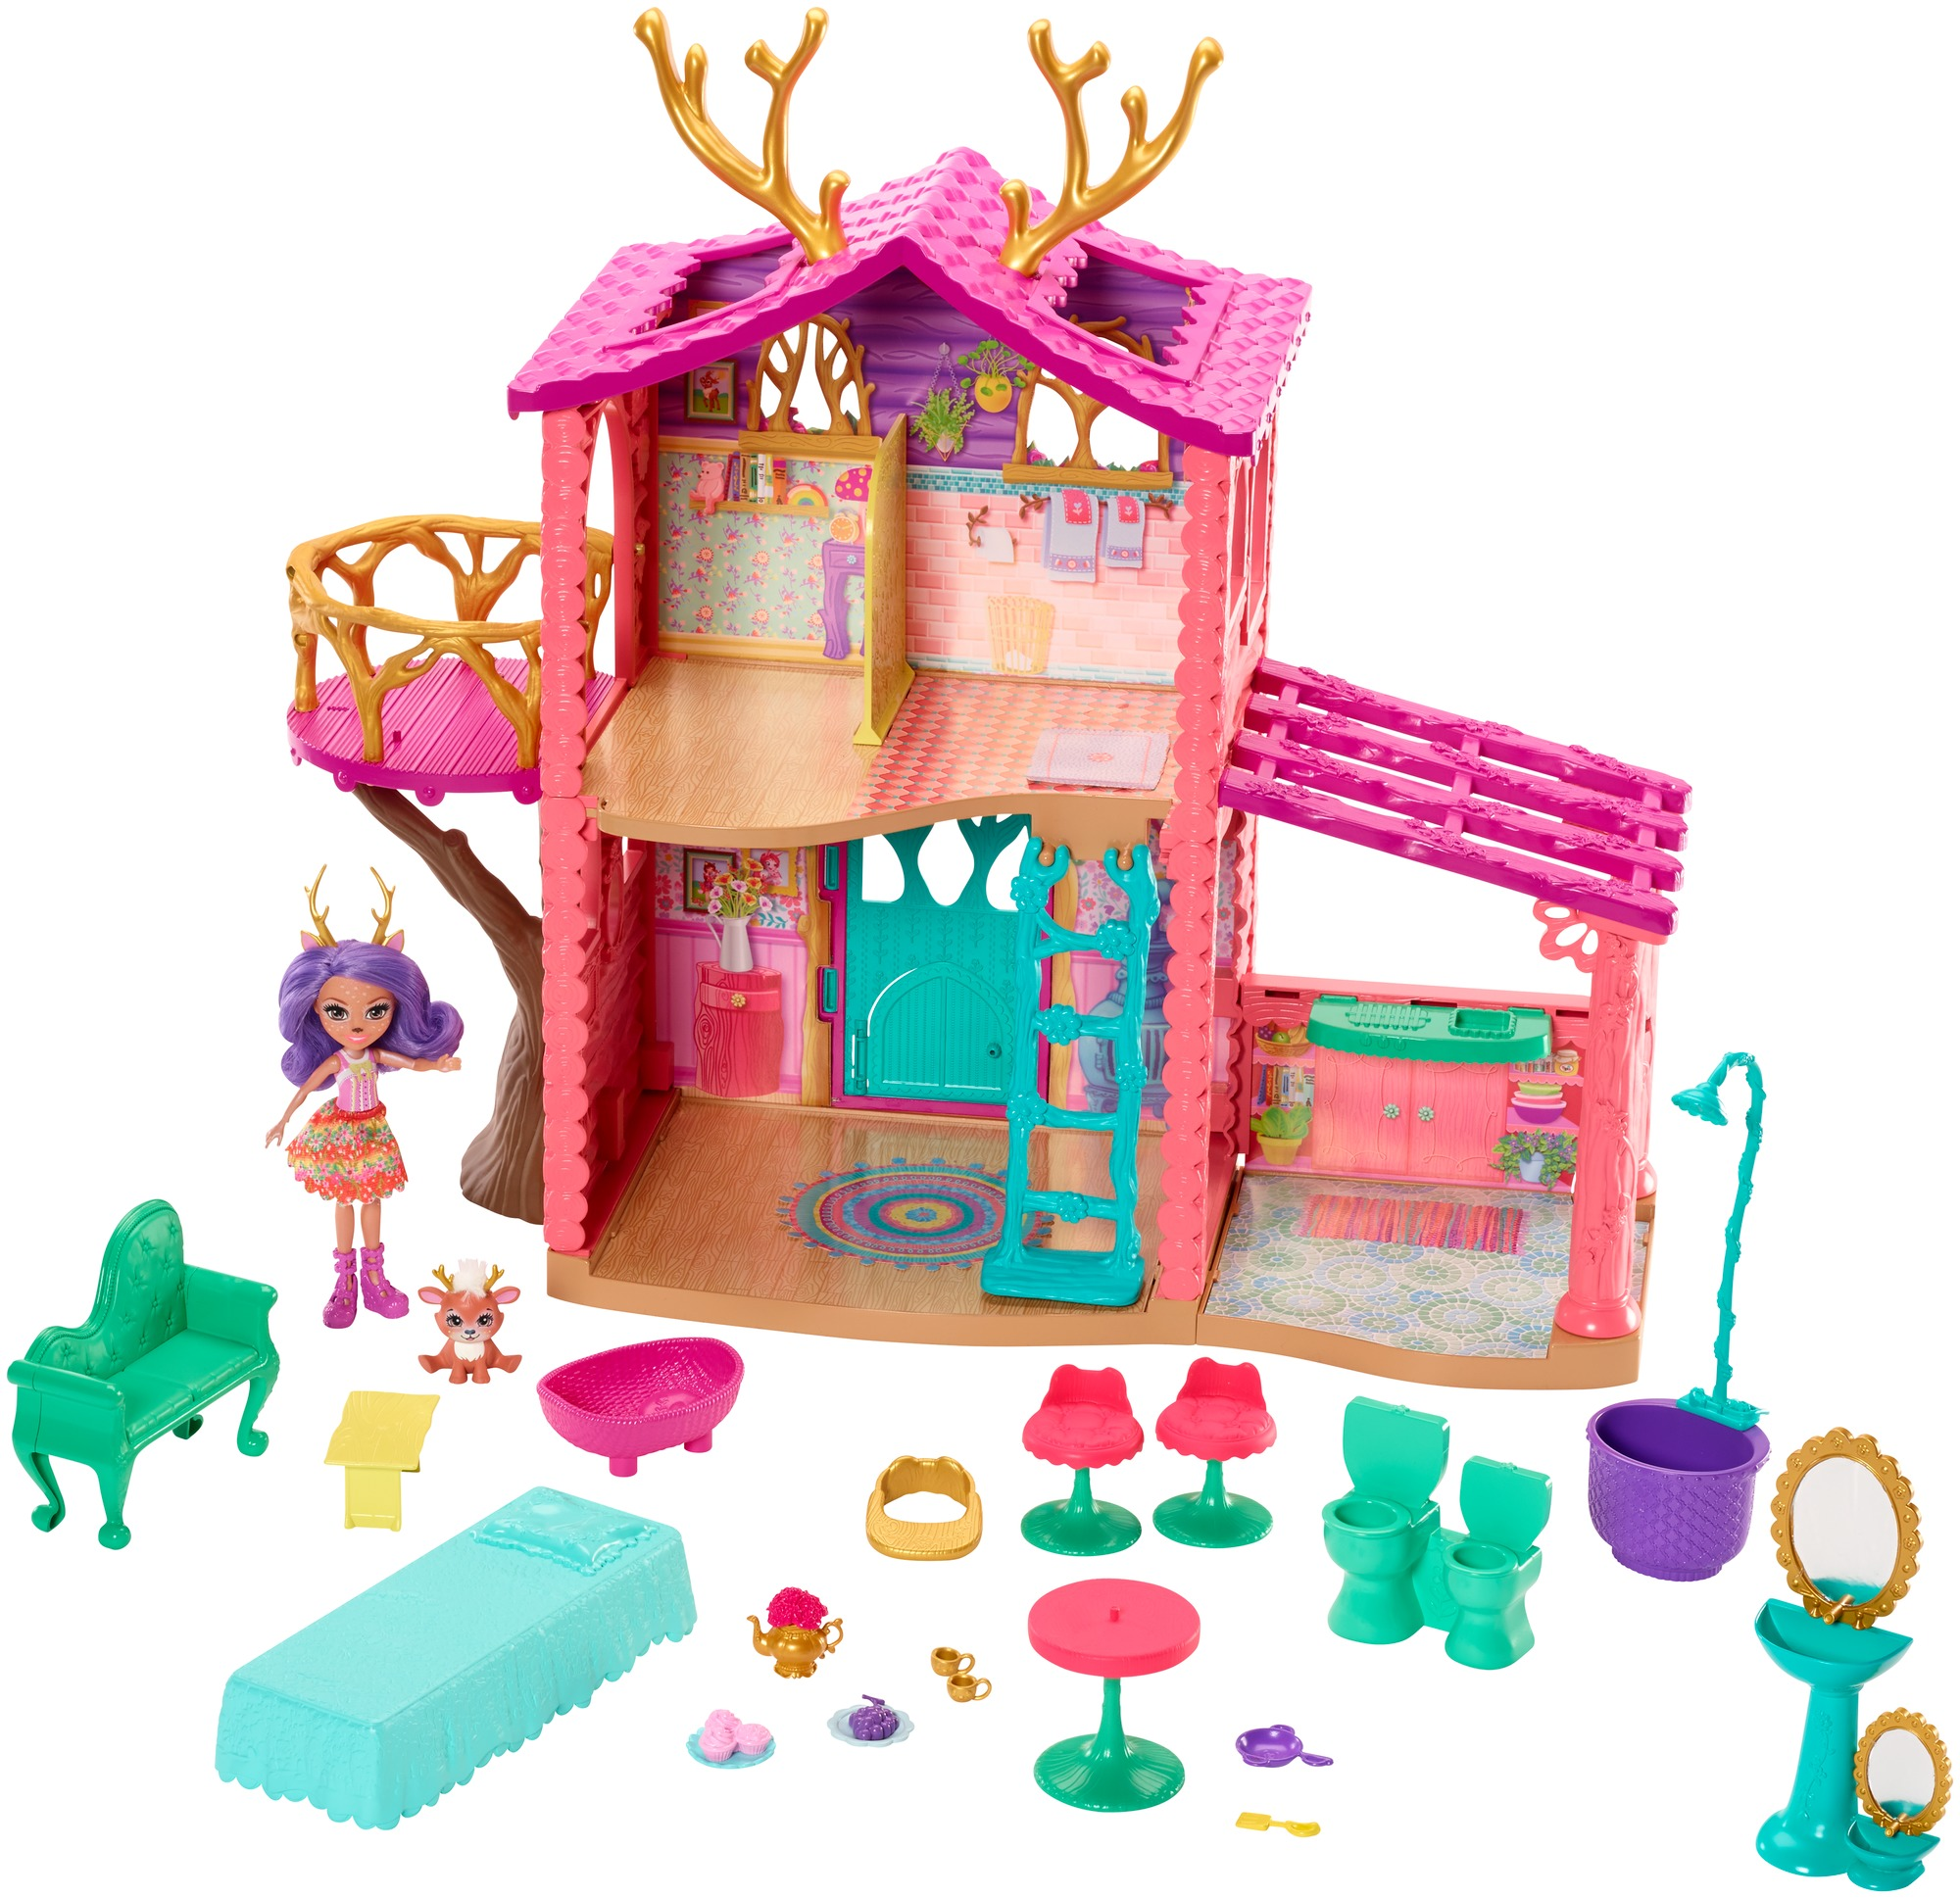 Enchantimals Cozy Deer House Playset + Danessa Deer Doll & Sprint Figure